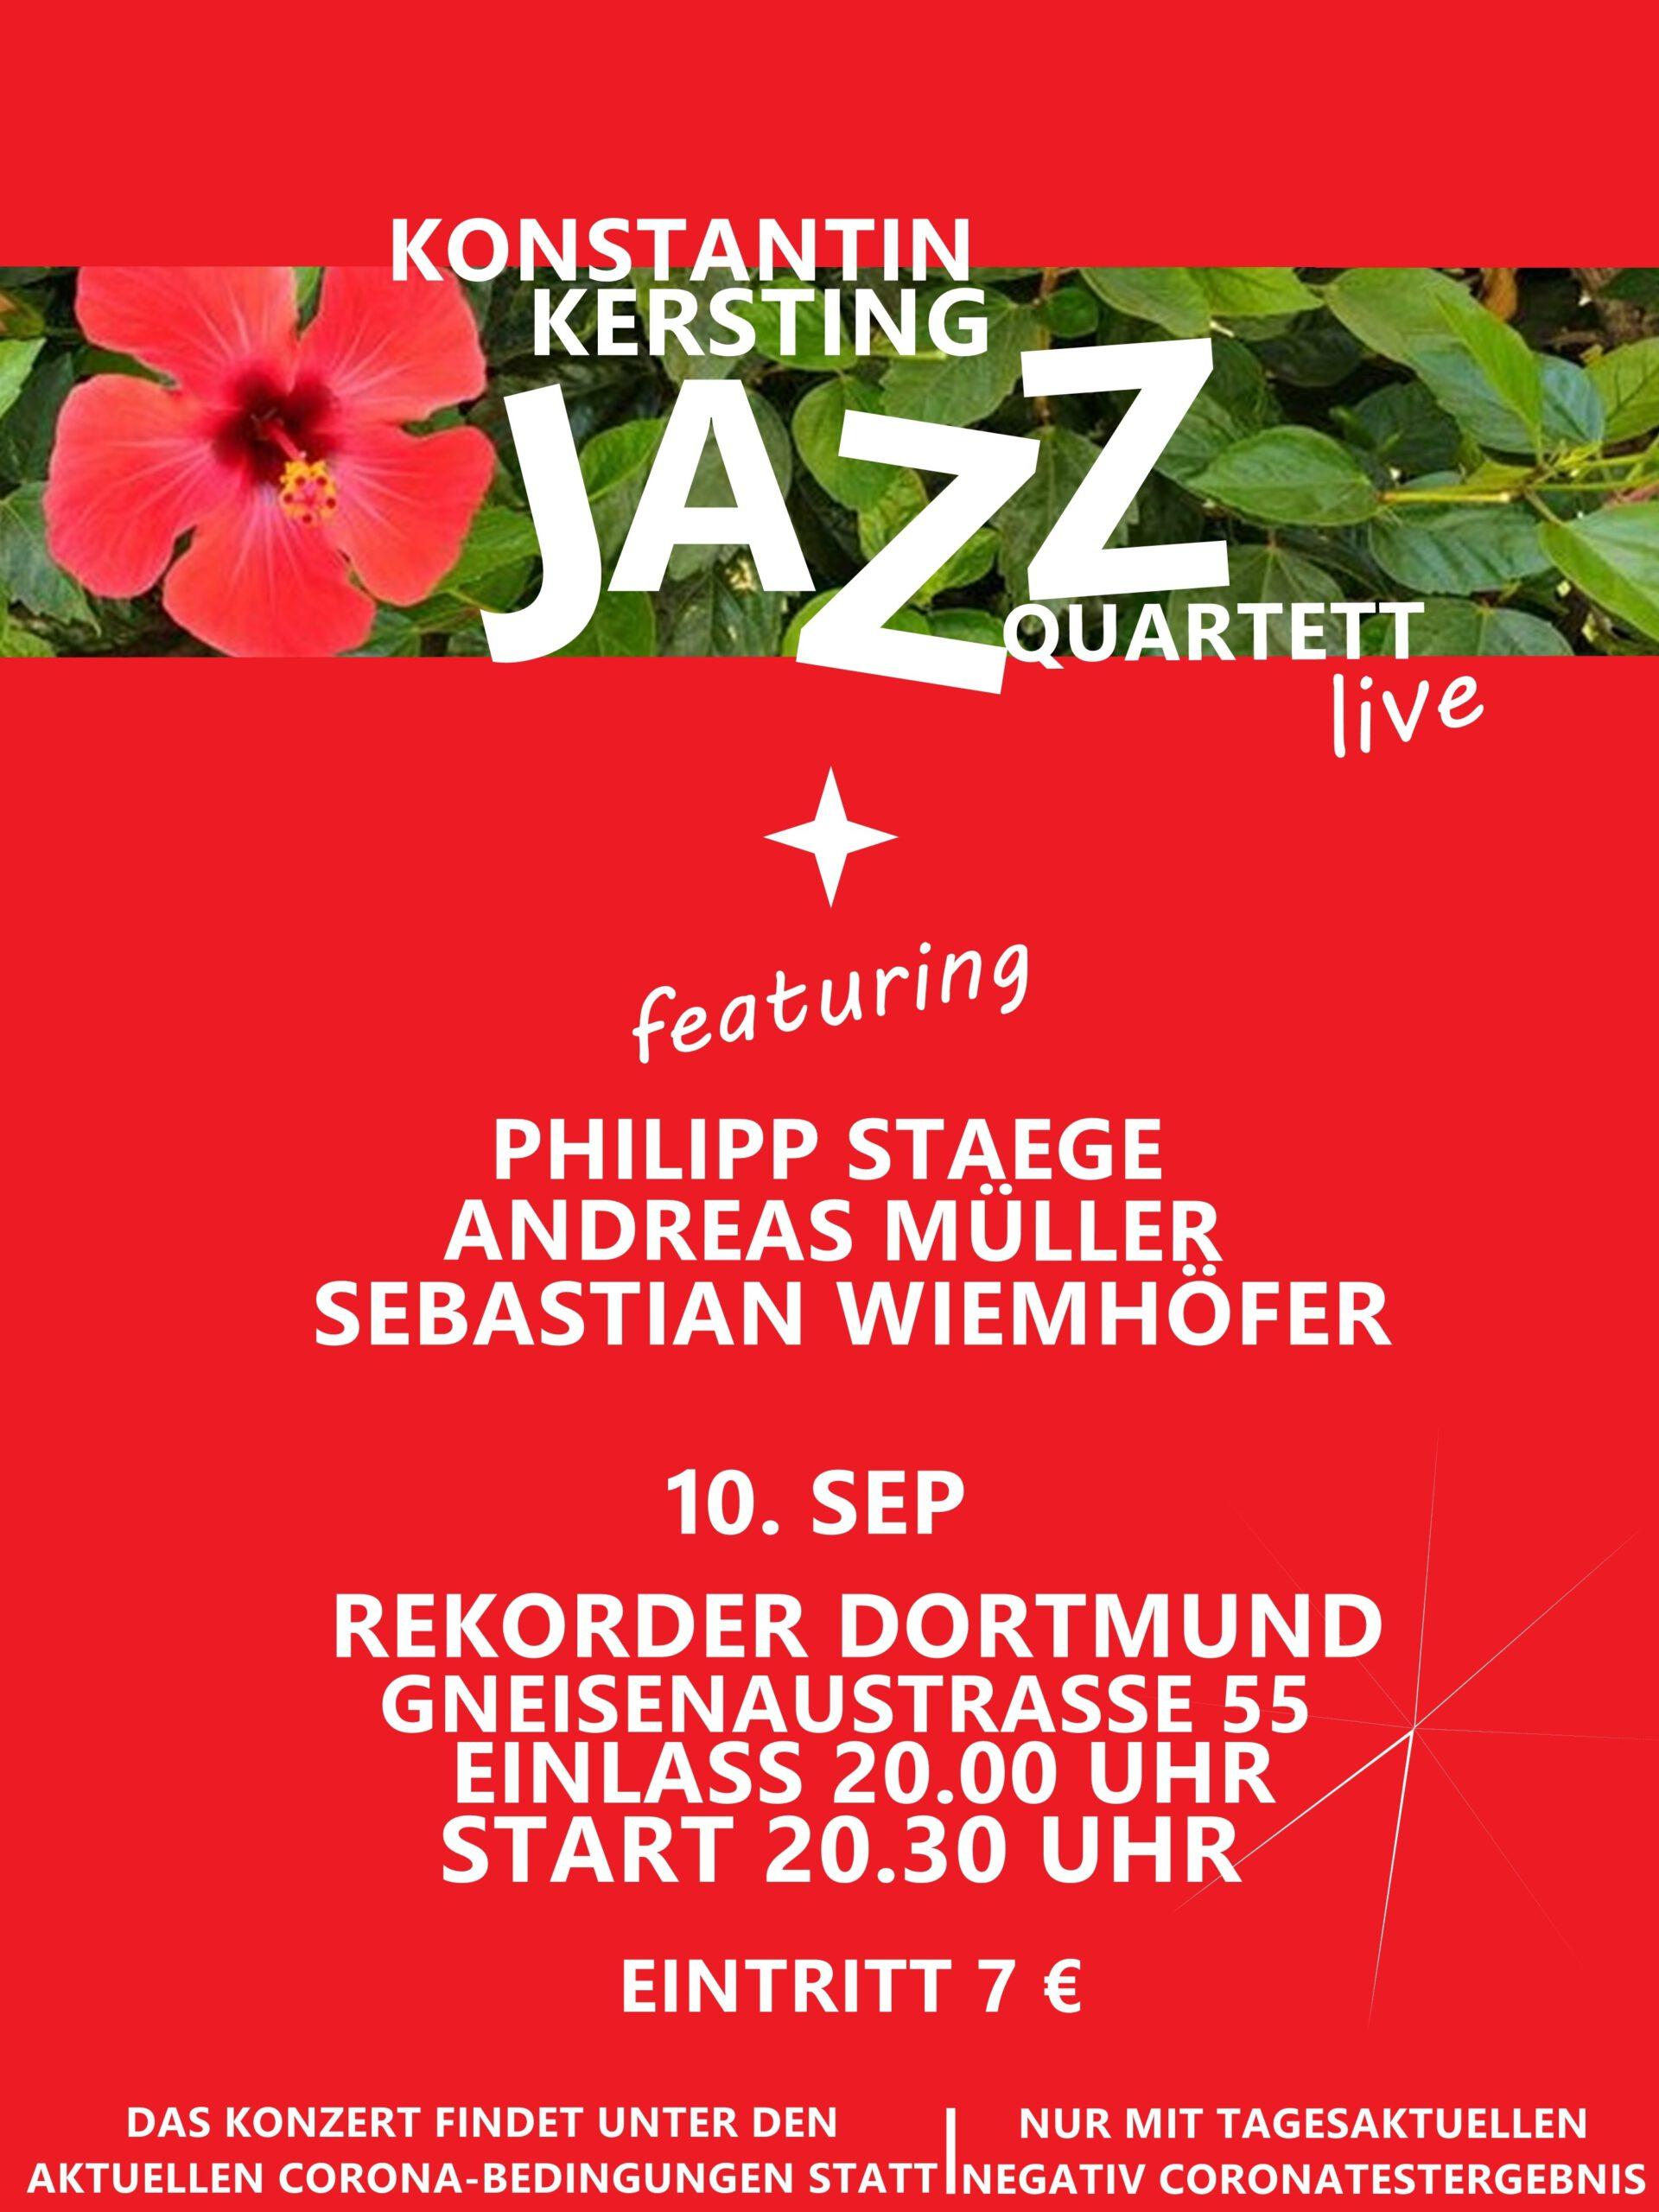 Konzert: Konstantin Kersting Jazz Quartett